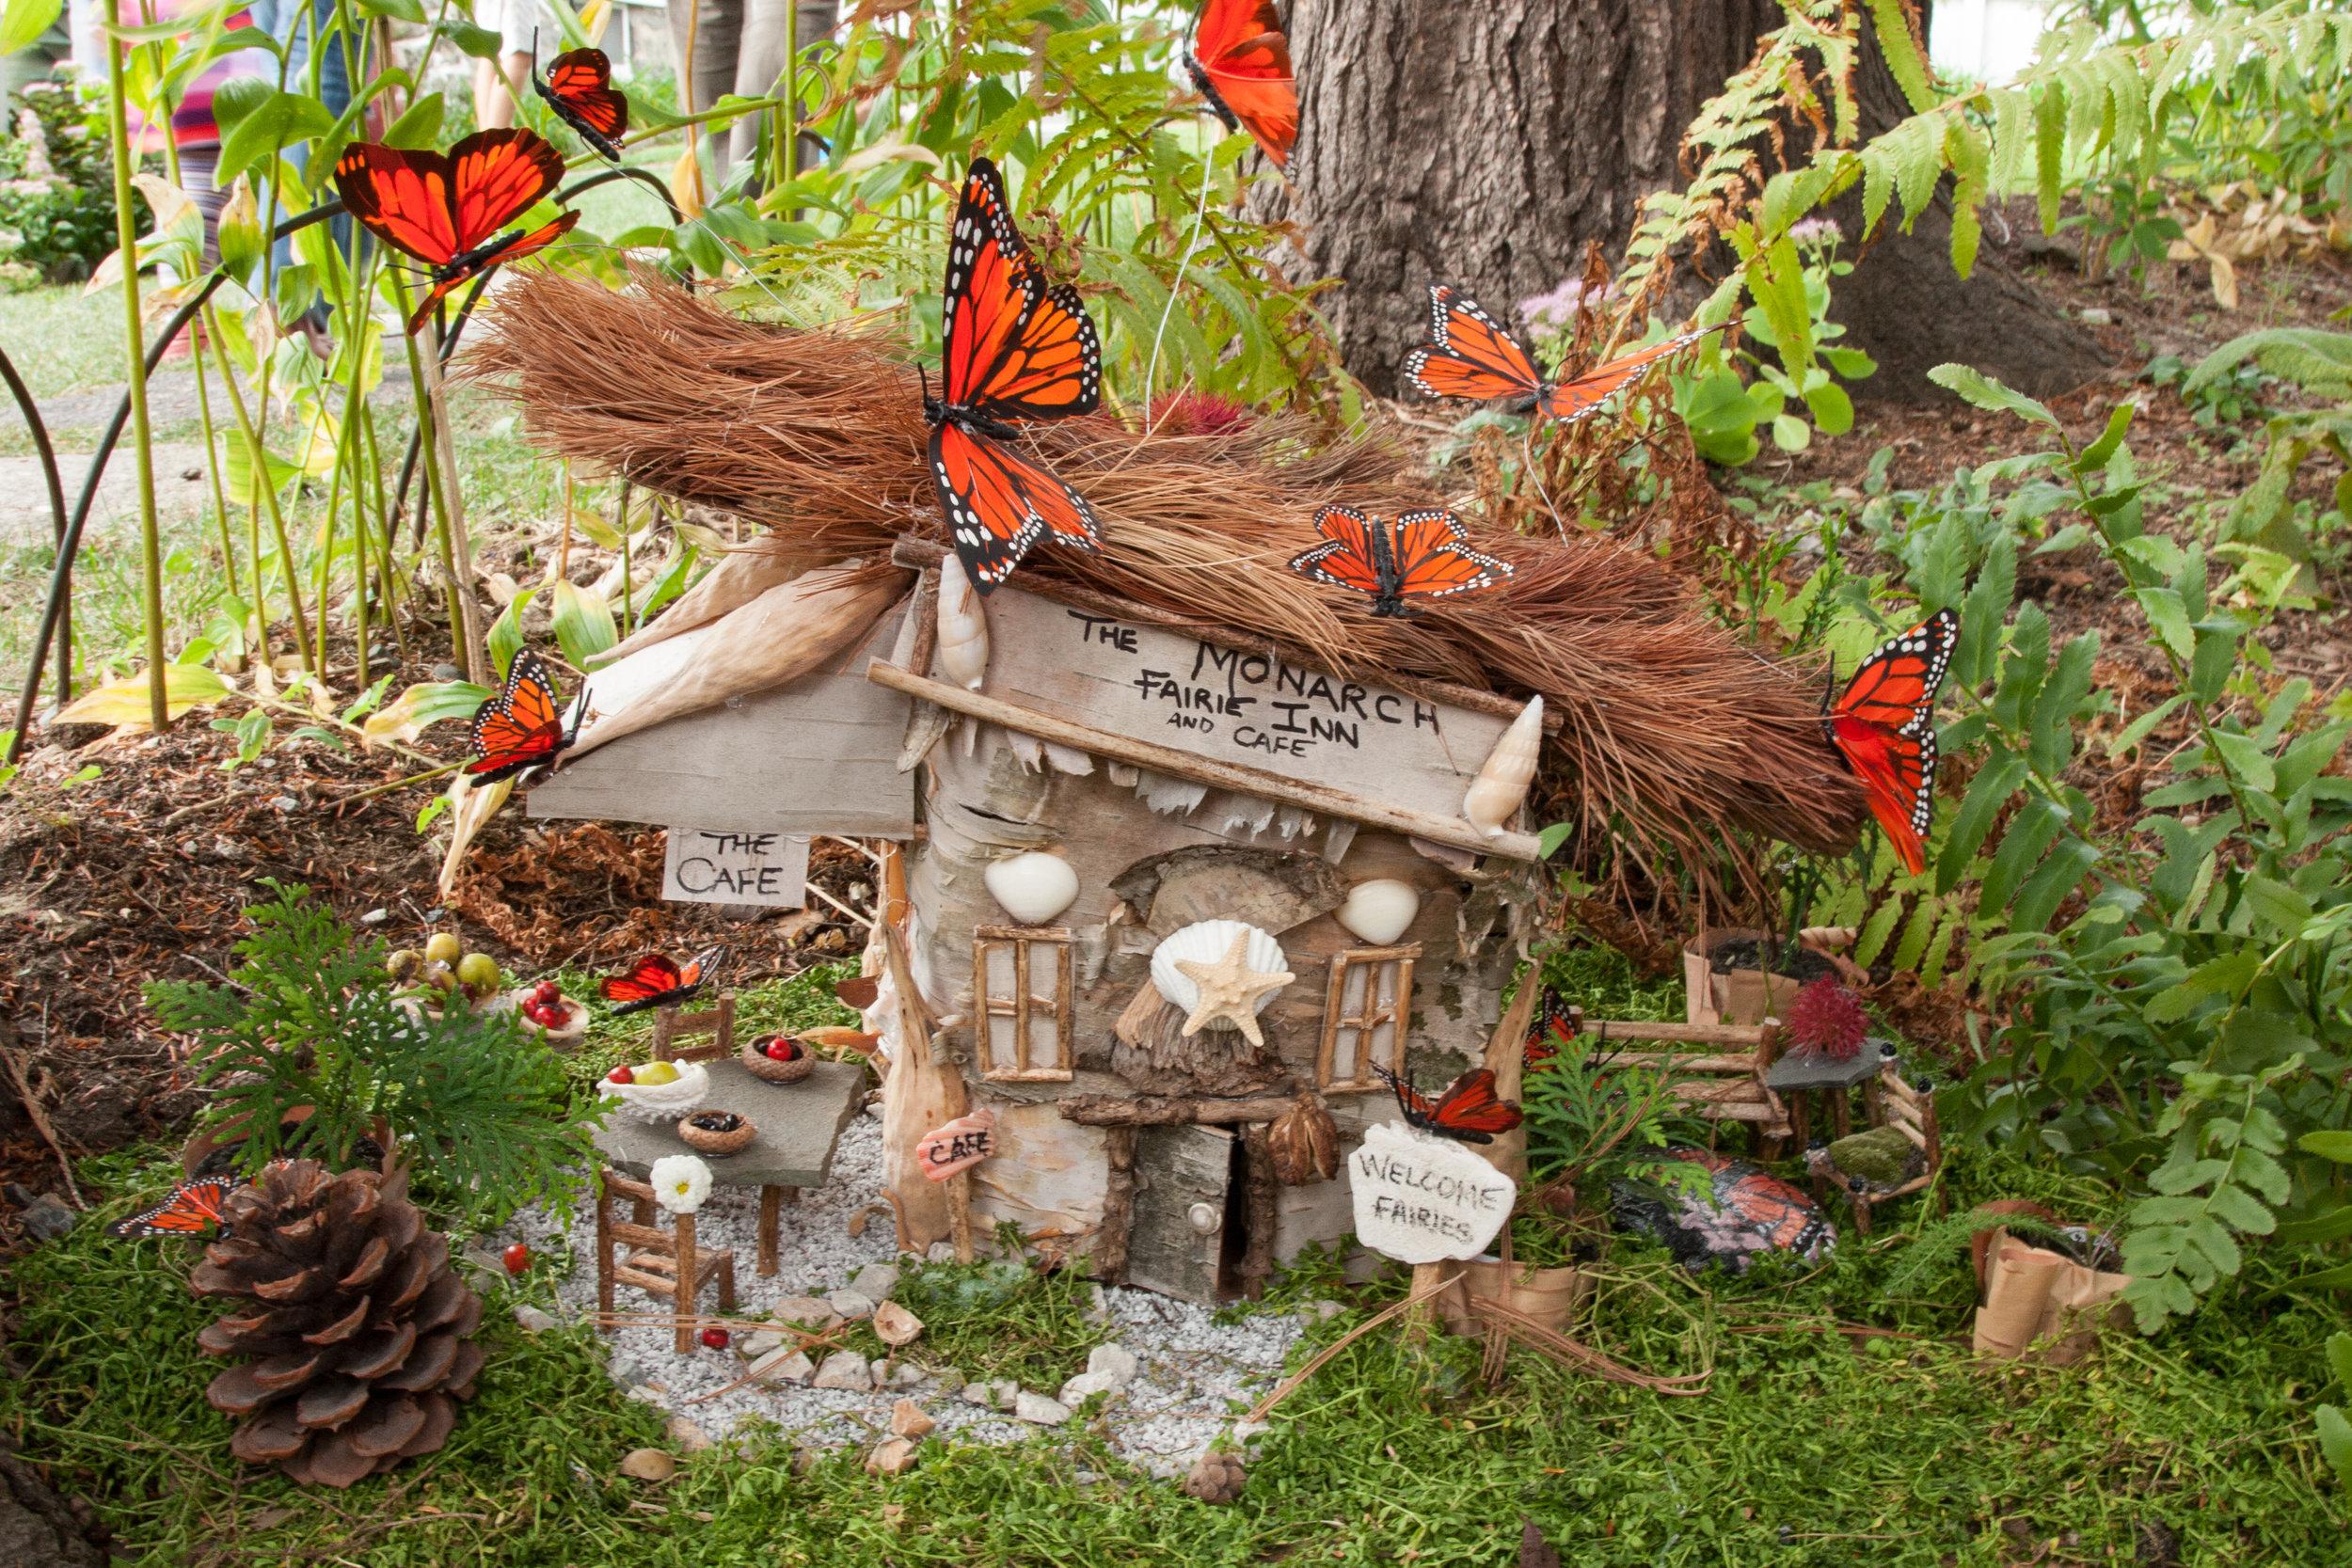 The Monarch Fairie Inn and Cafe Shadow Box